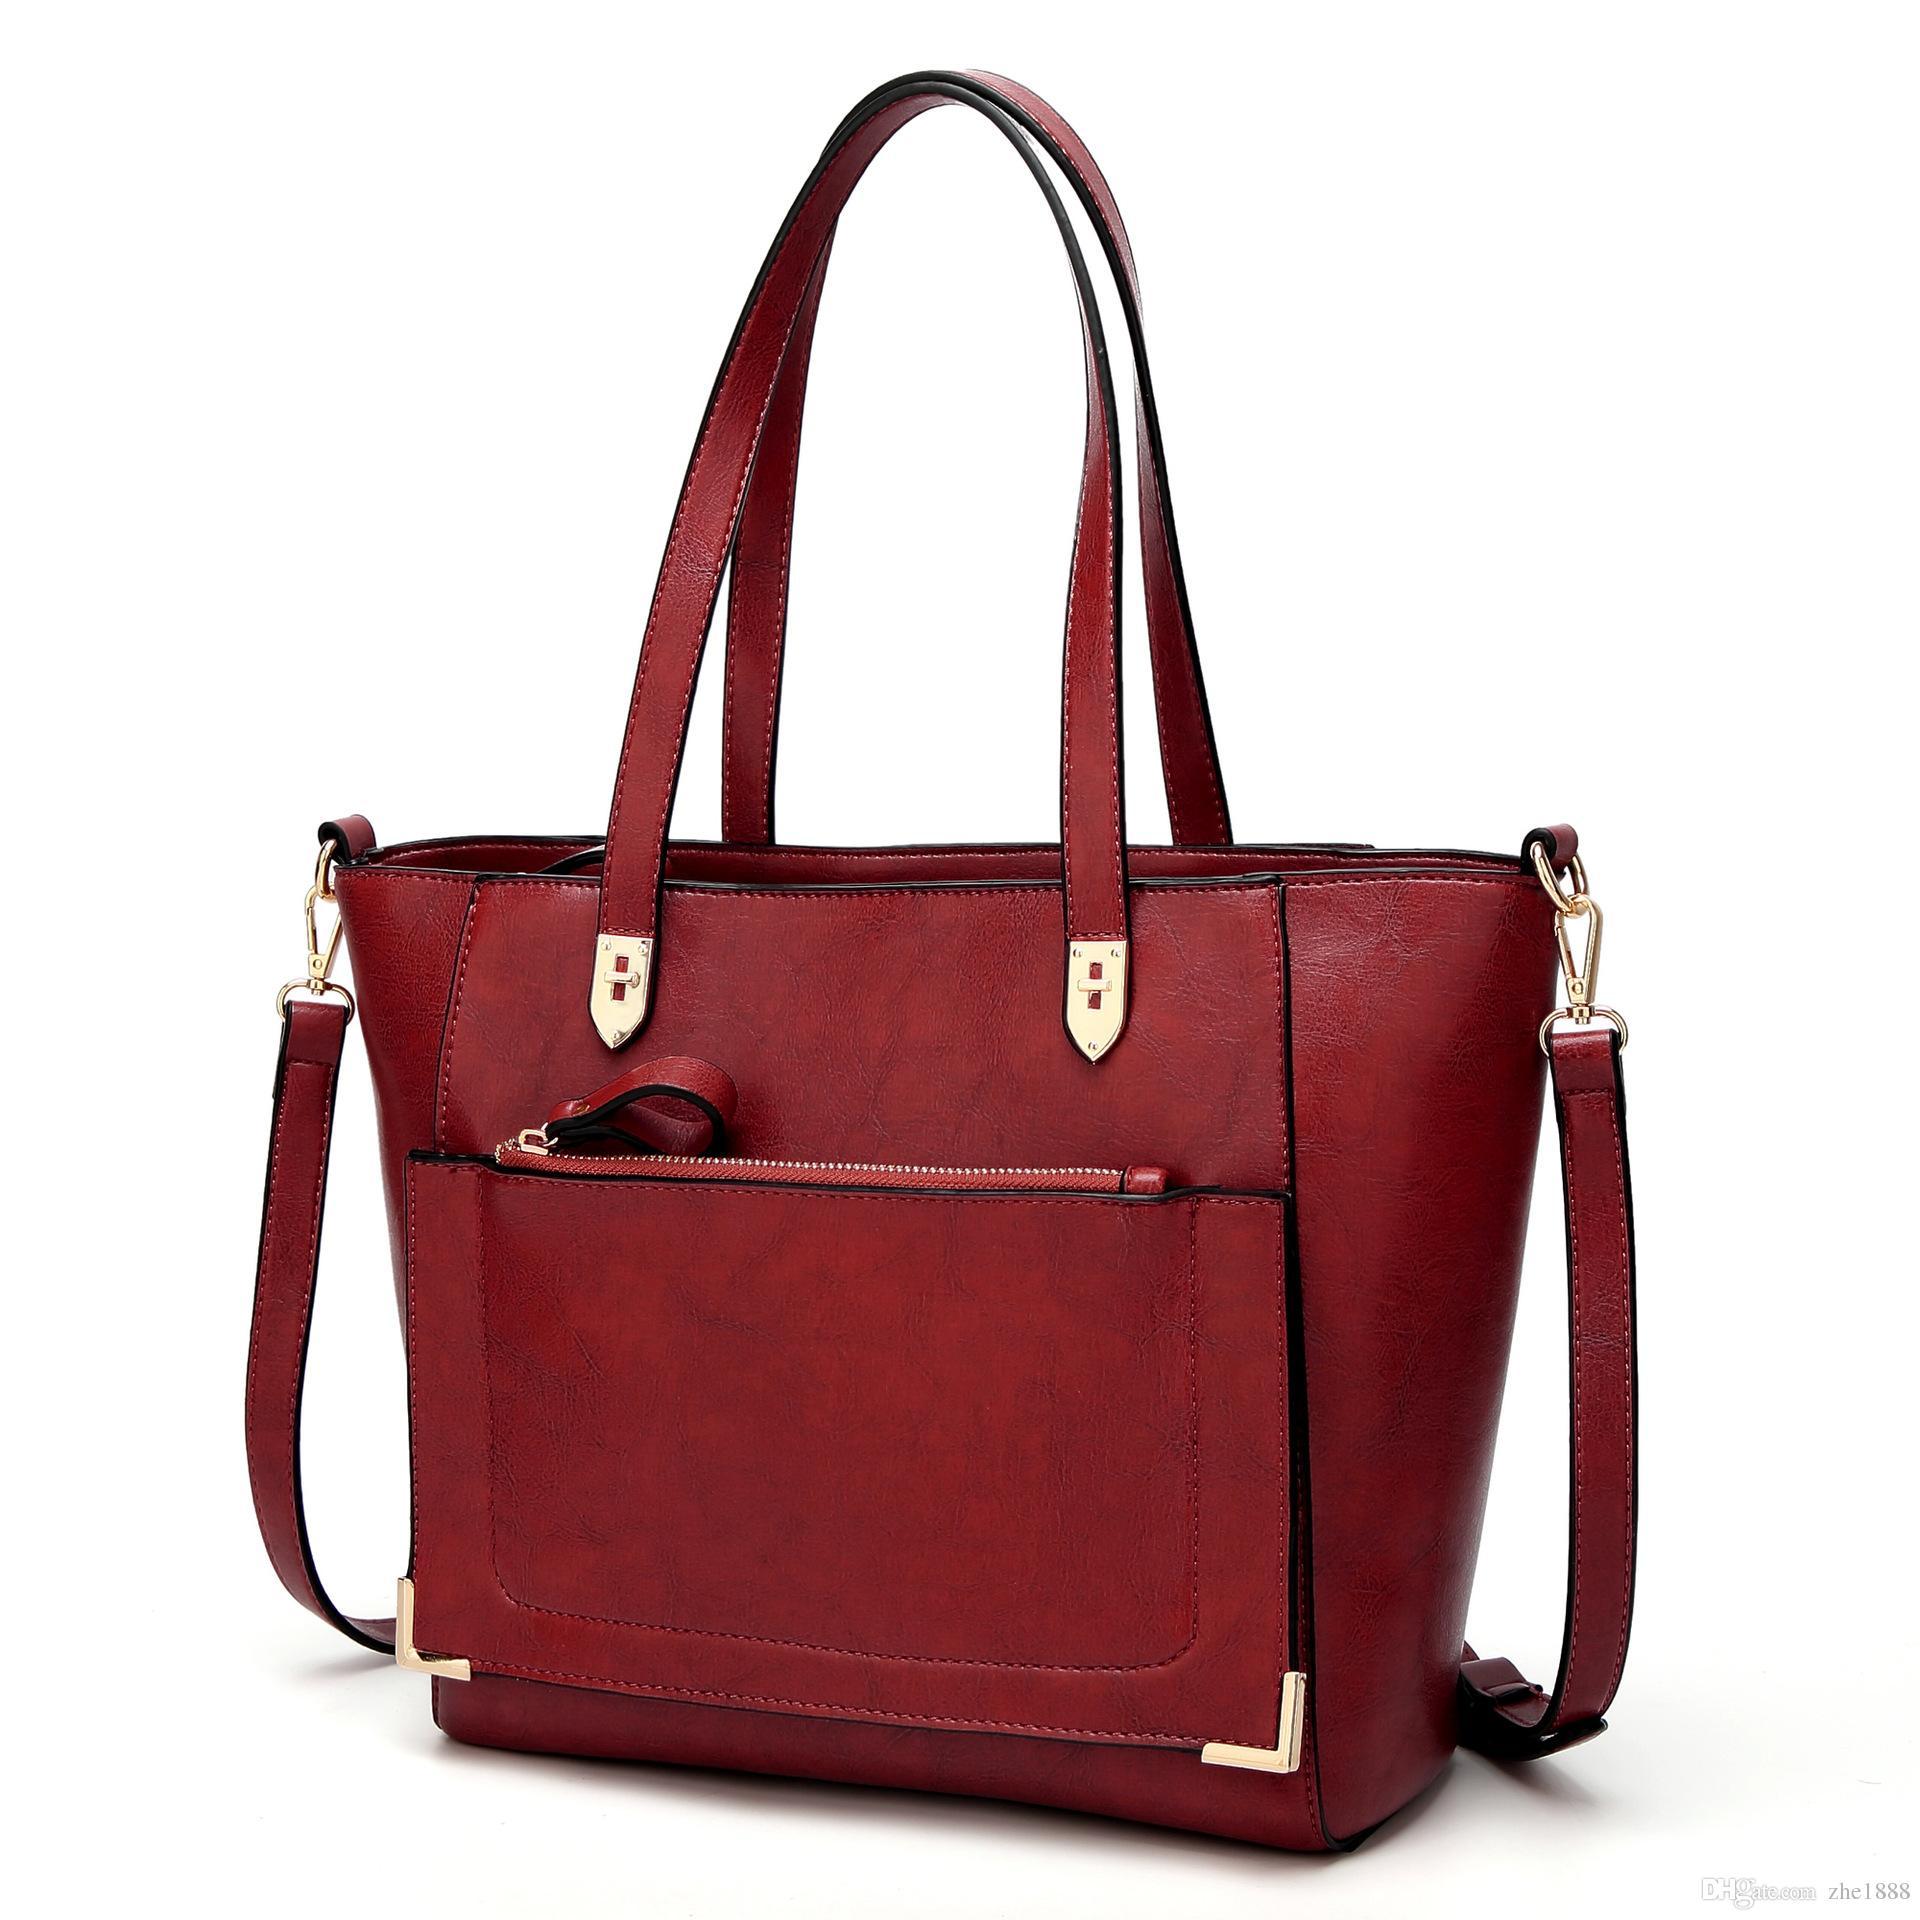 ad391ed20801 2018 new best selling women's bag fashion handbag casual shoulder slung  tote bag ladies bag